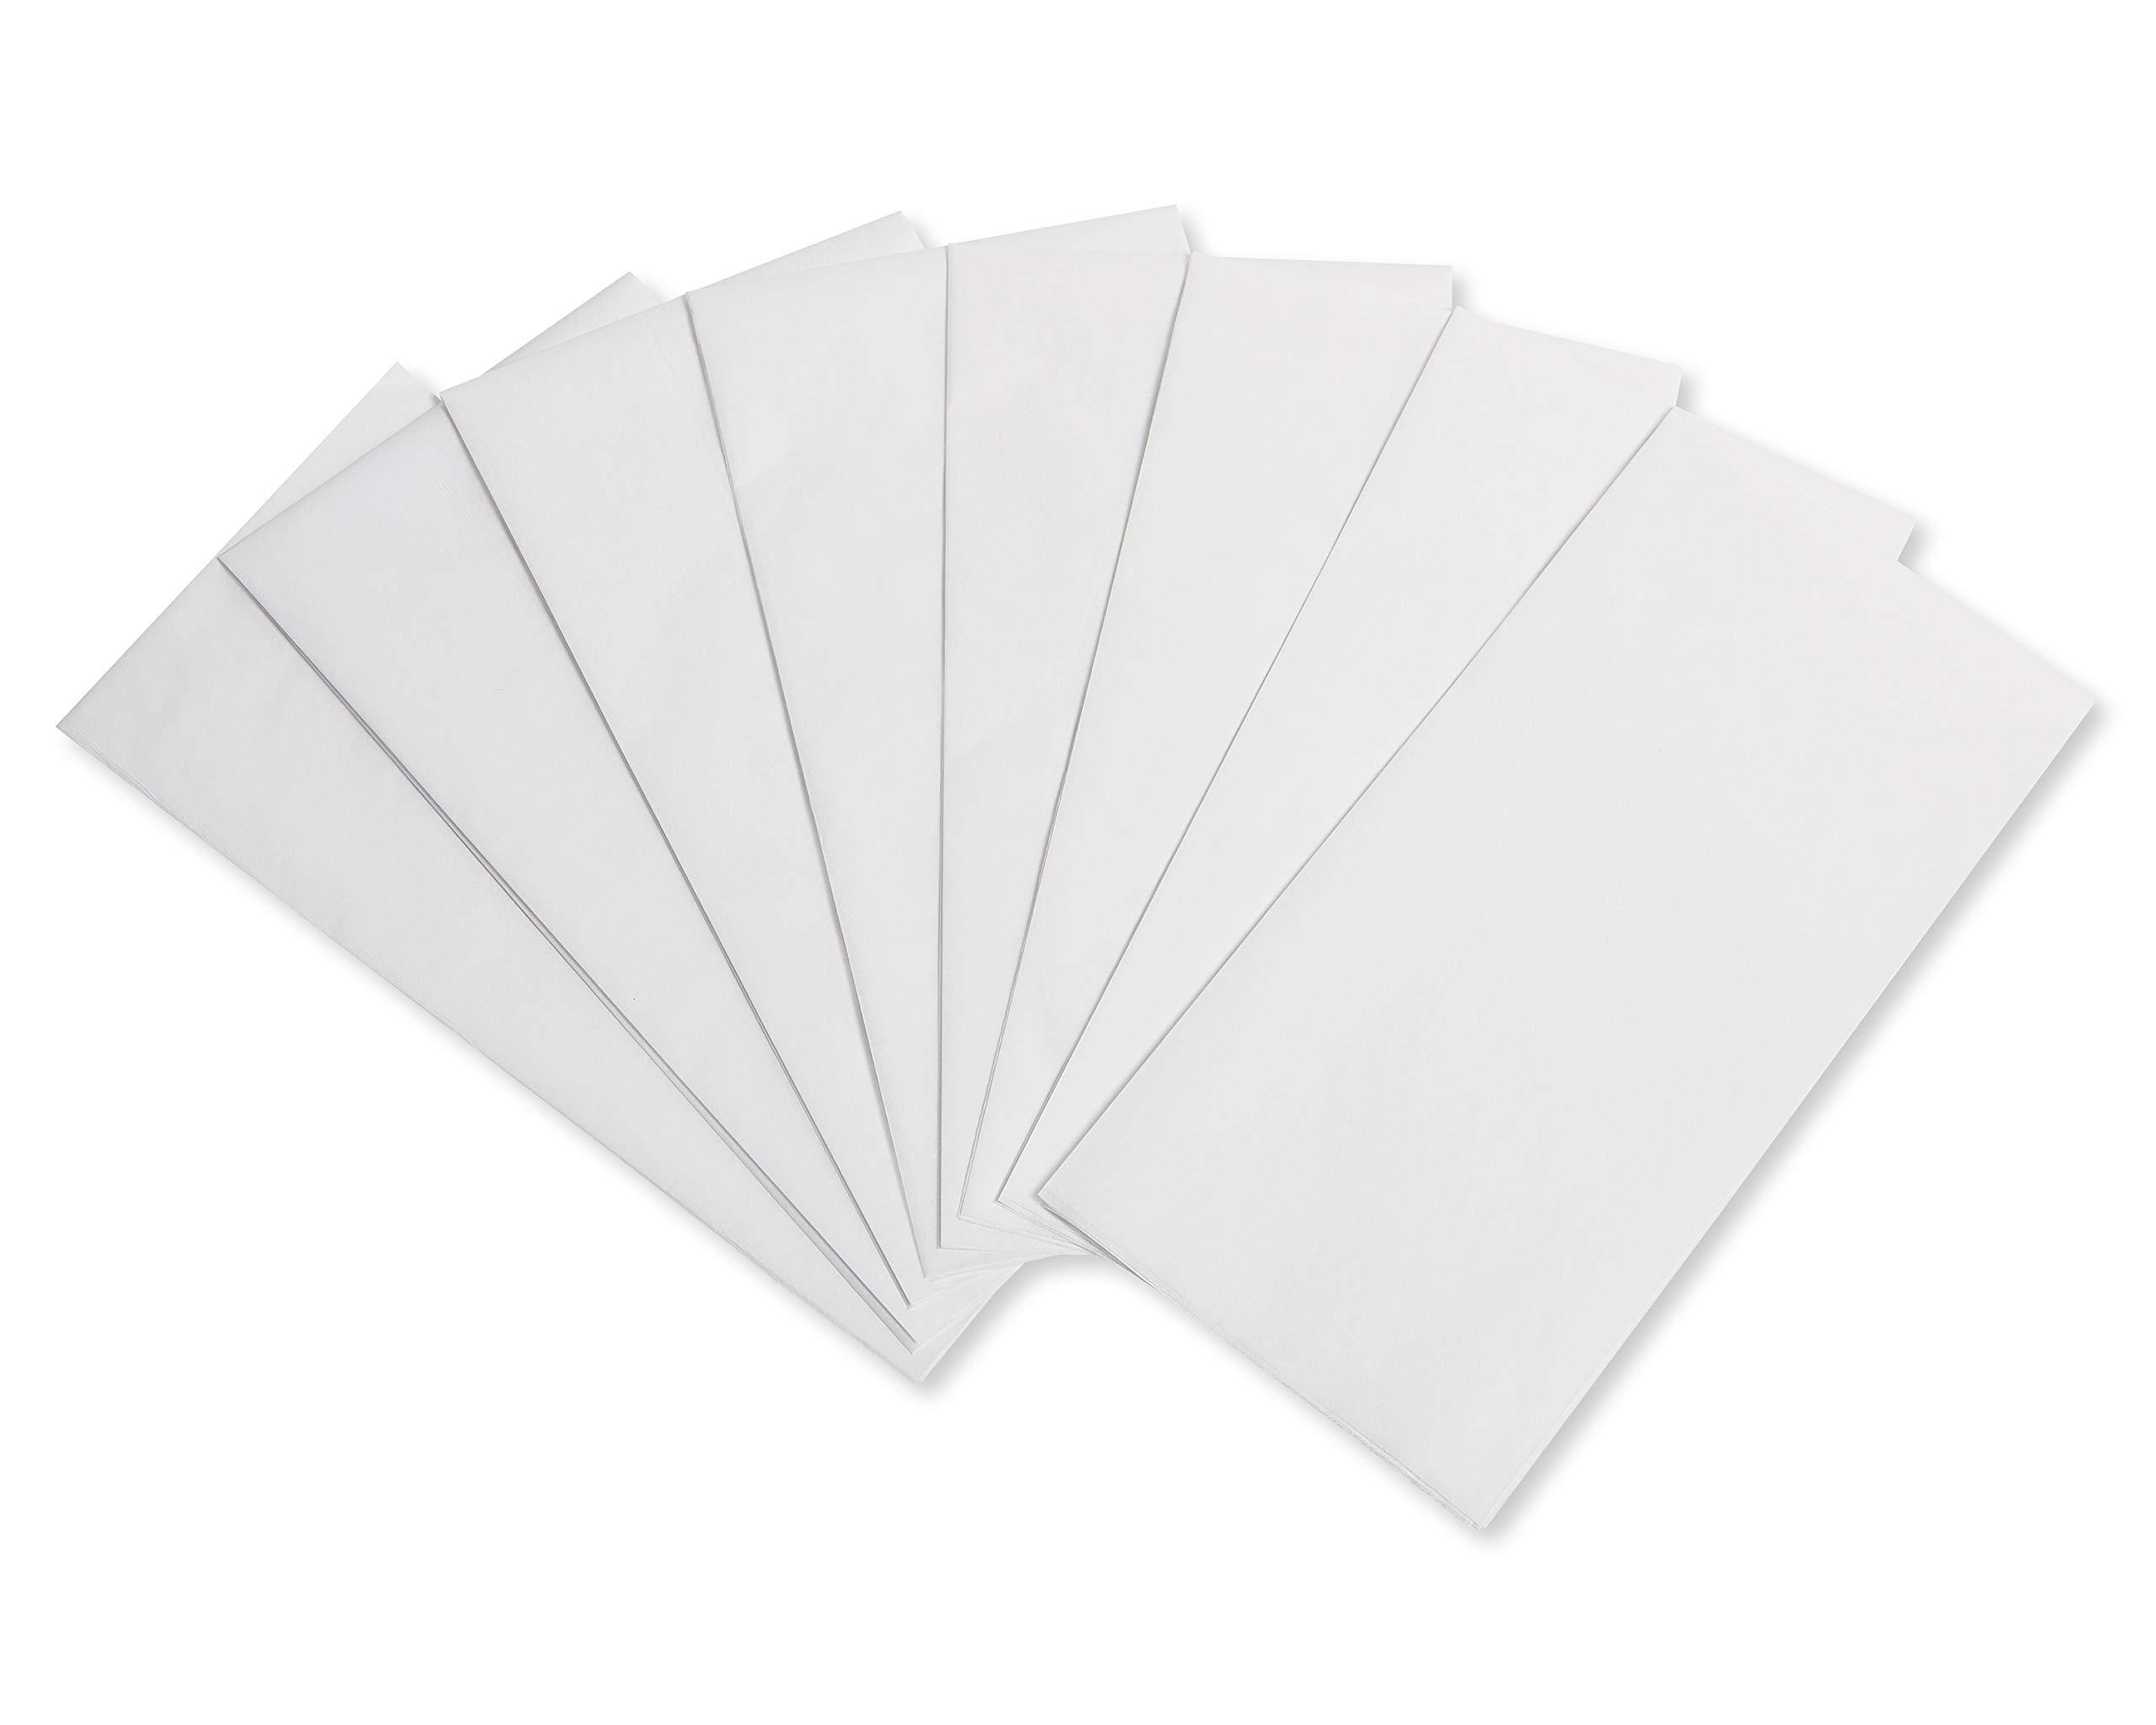 American Greetings White Tissue Paper, Bulk (200-Sheets)